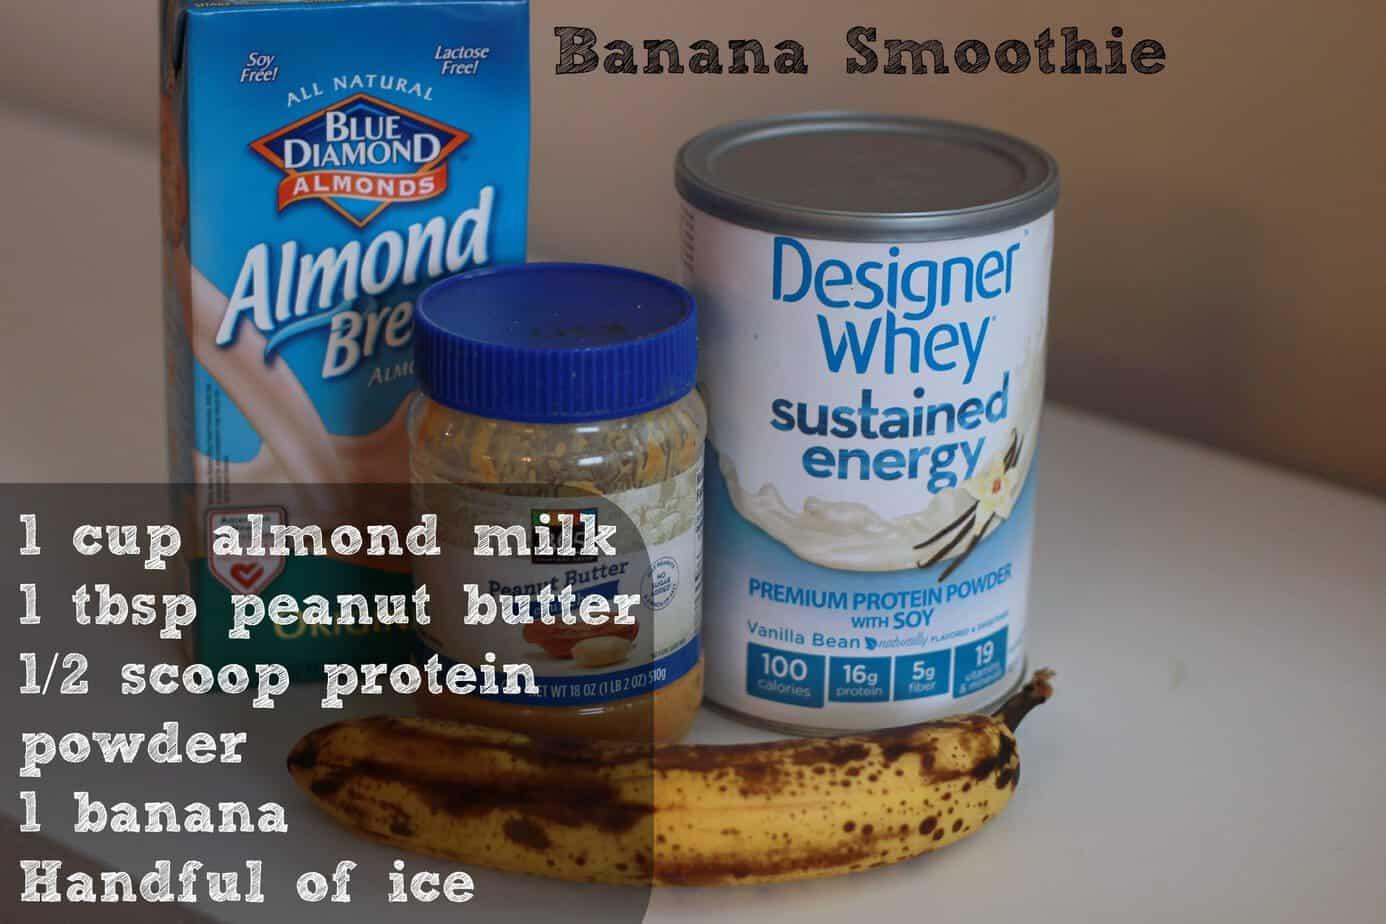 banana smoothie.jpg